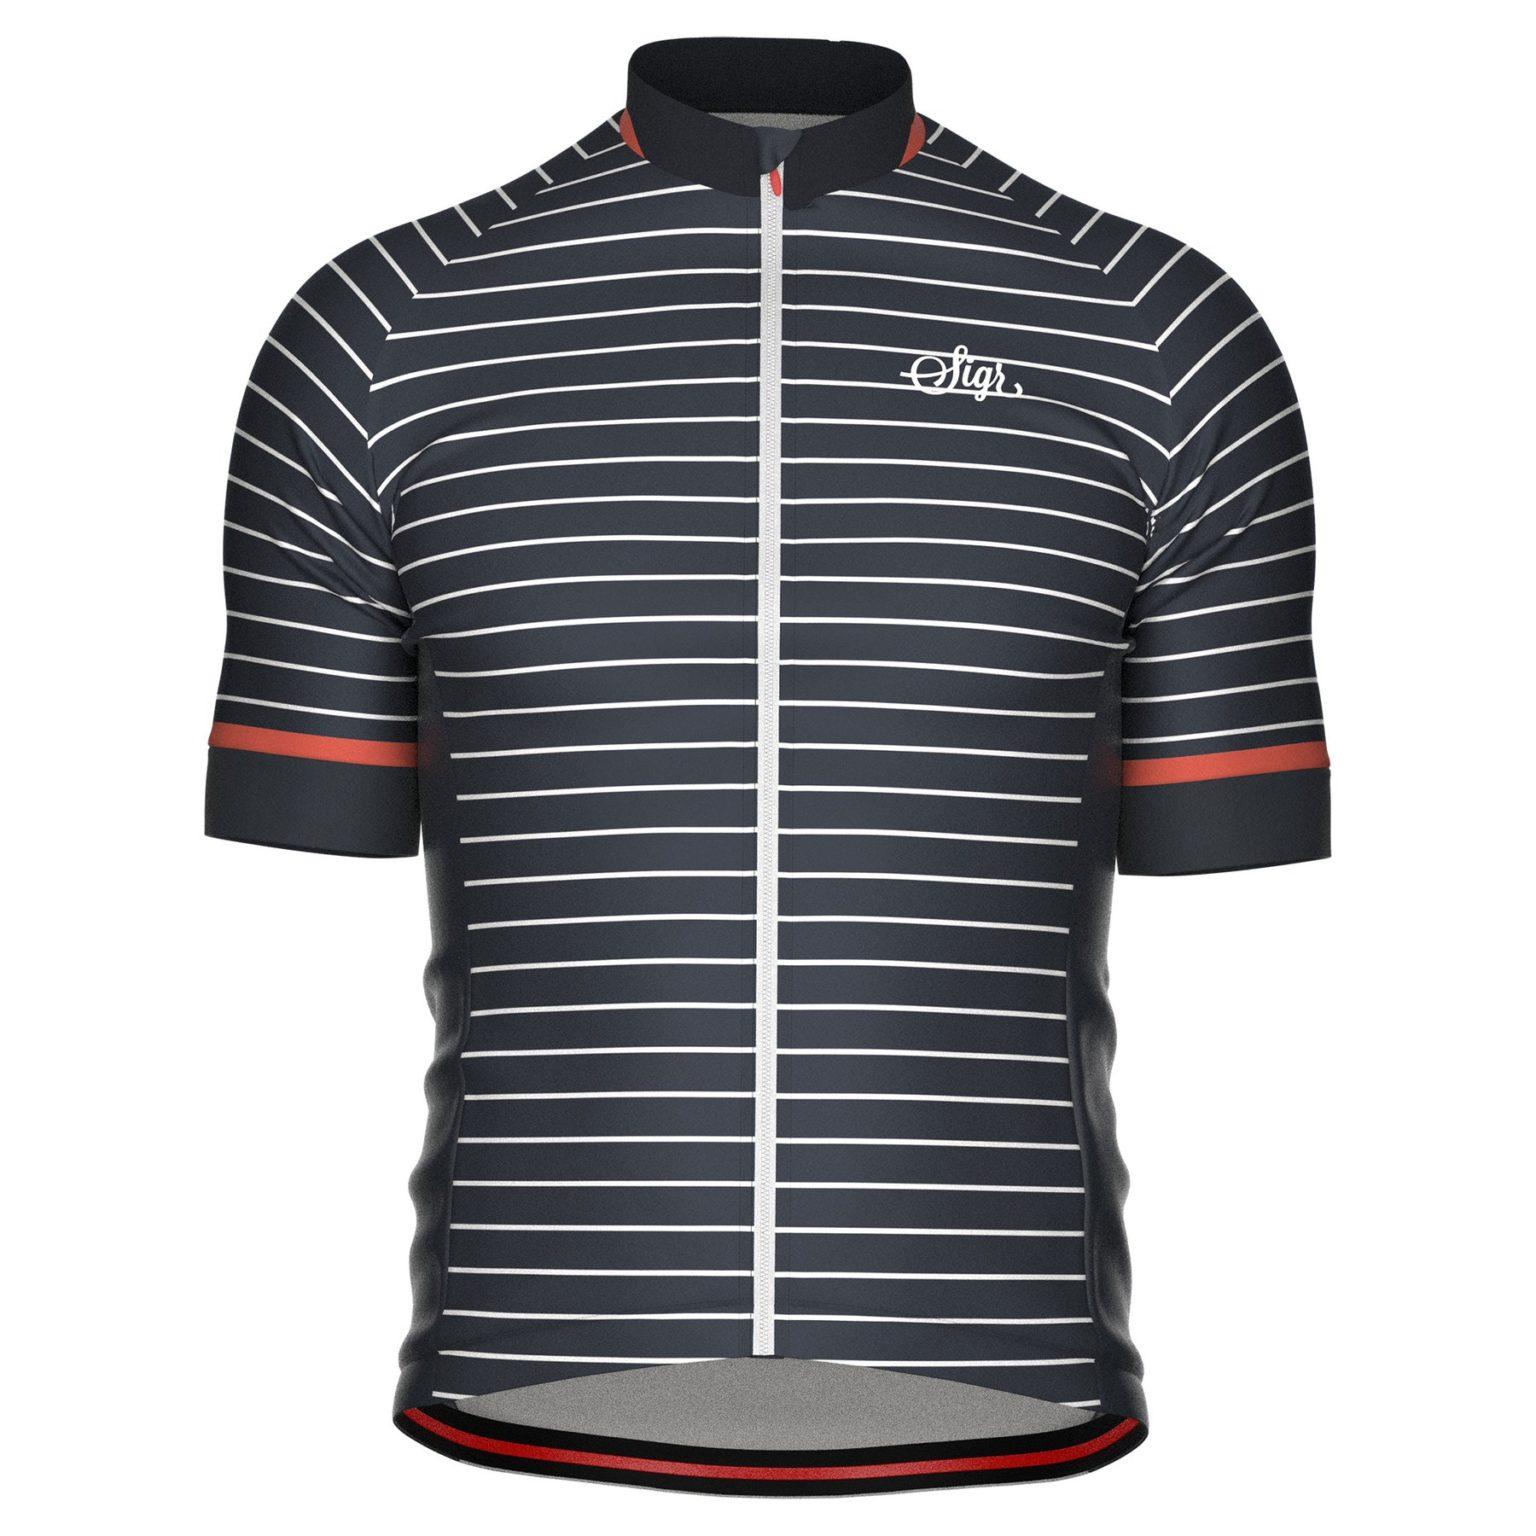 Sigr Black Horizon Cycling Jersey for Men Front 1800x1800